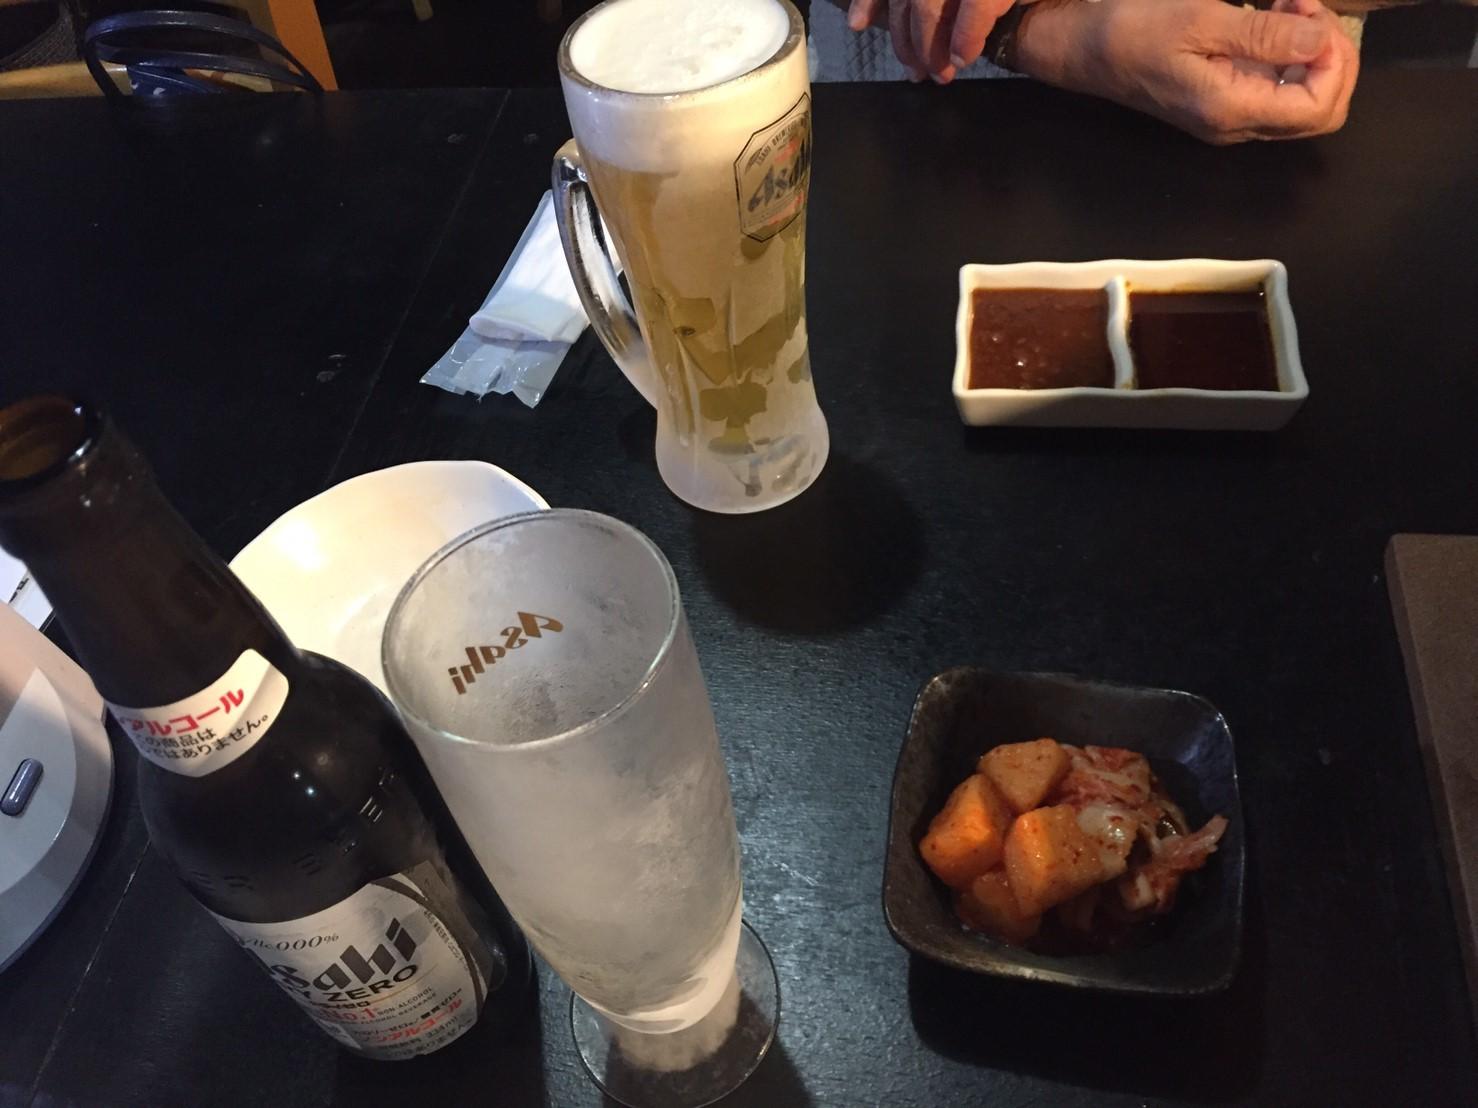 焼肉 鳥取牧場村 厚切りタン・山葵塩_e0115904_07490399.jpg